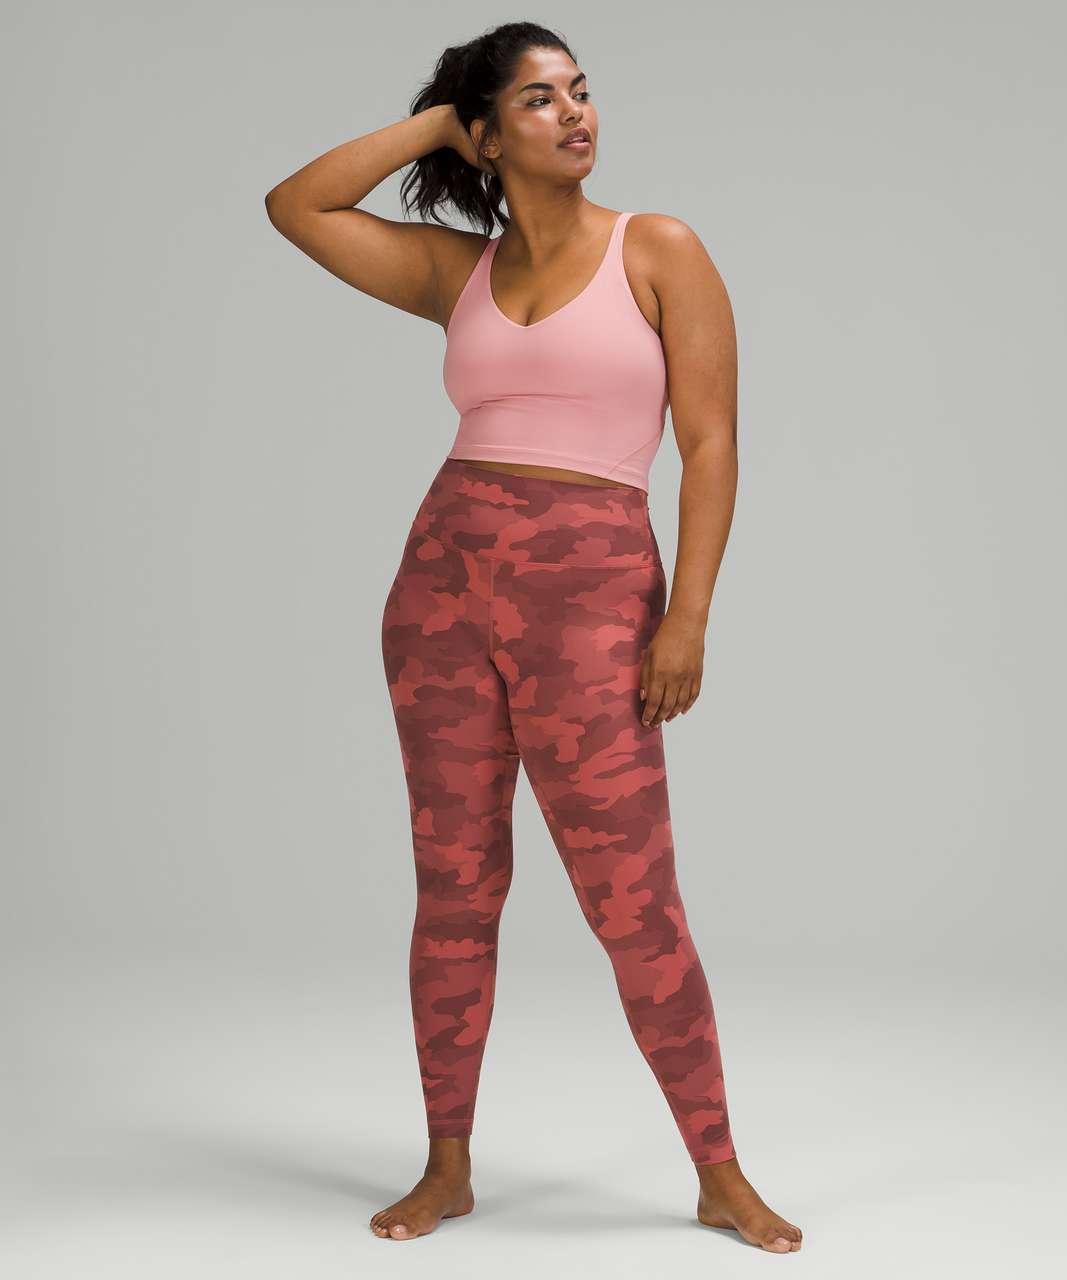 "Lululemon Align High-Rise Pant 28"" - Heritage 365 Camo Brier Rose Multi"